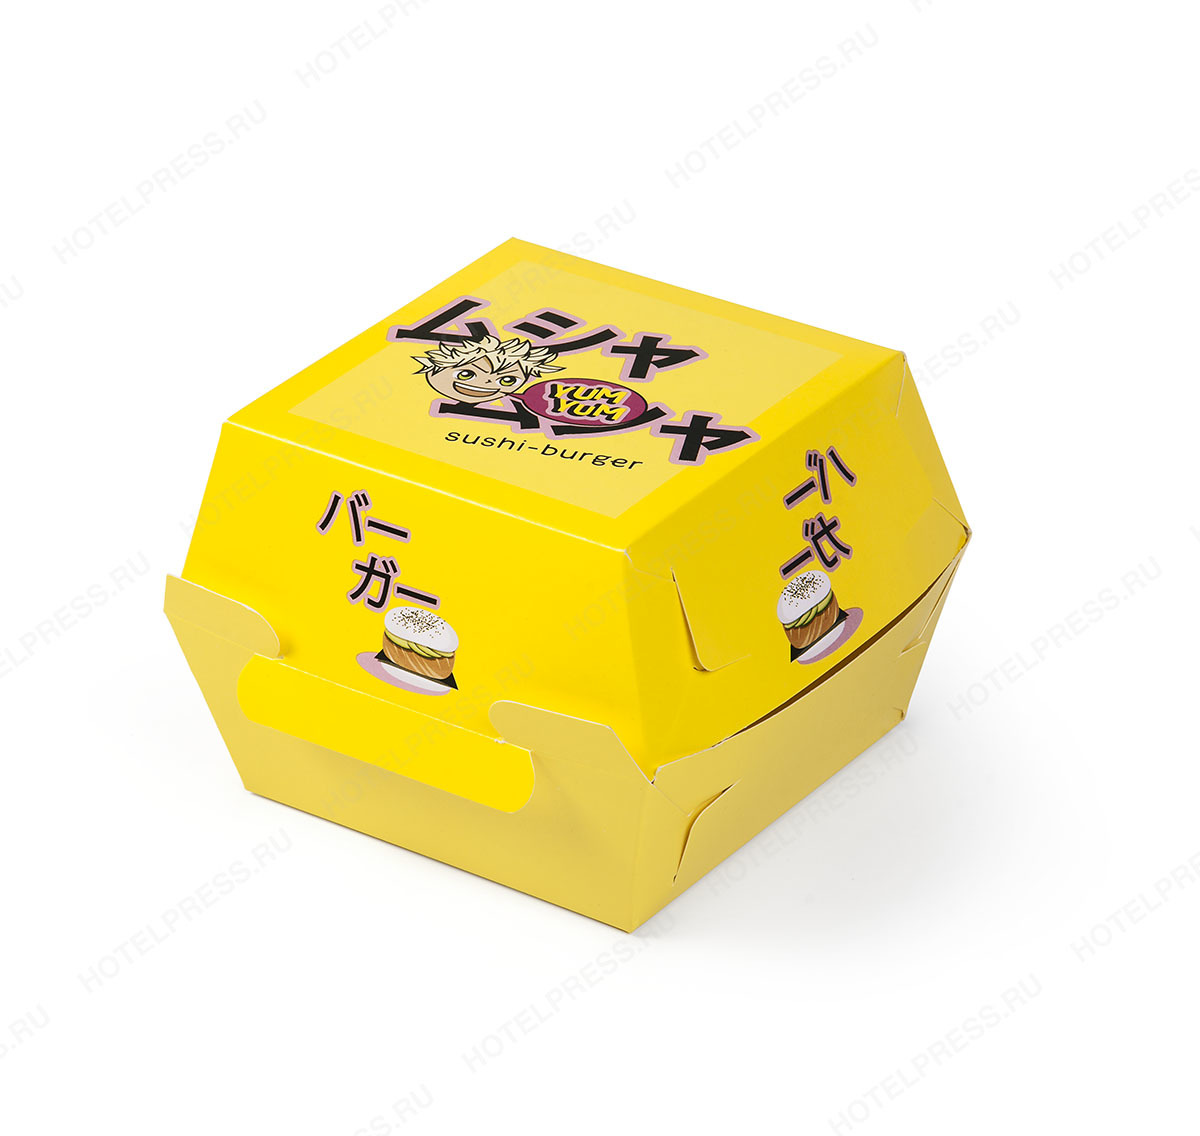 Коробка для бургера ресторана Yum Yum Sushi-burger